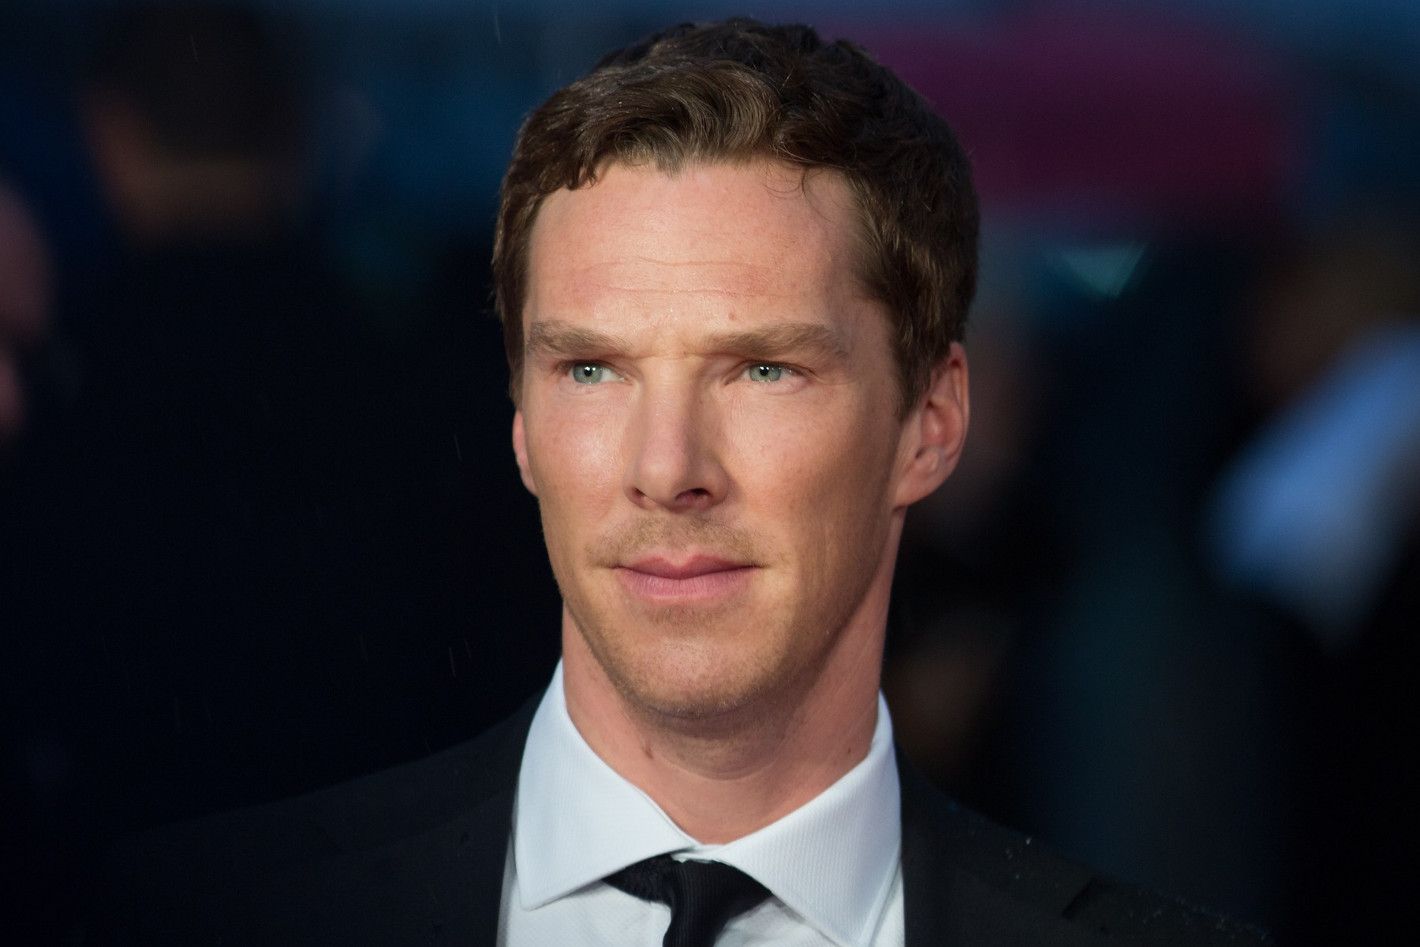 PProfimedia Bendedict Cumberbatch